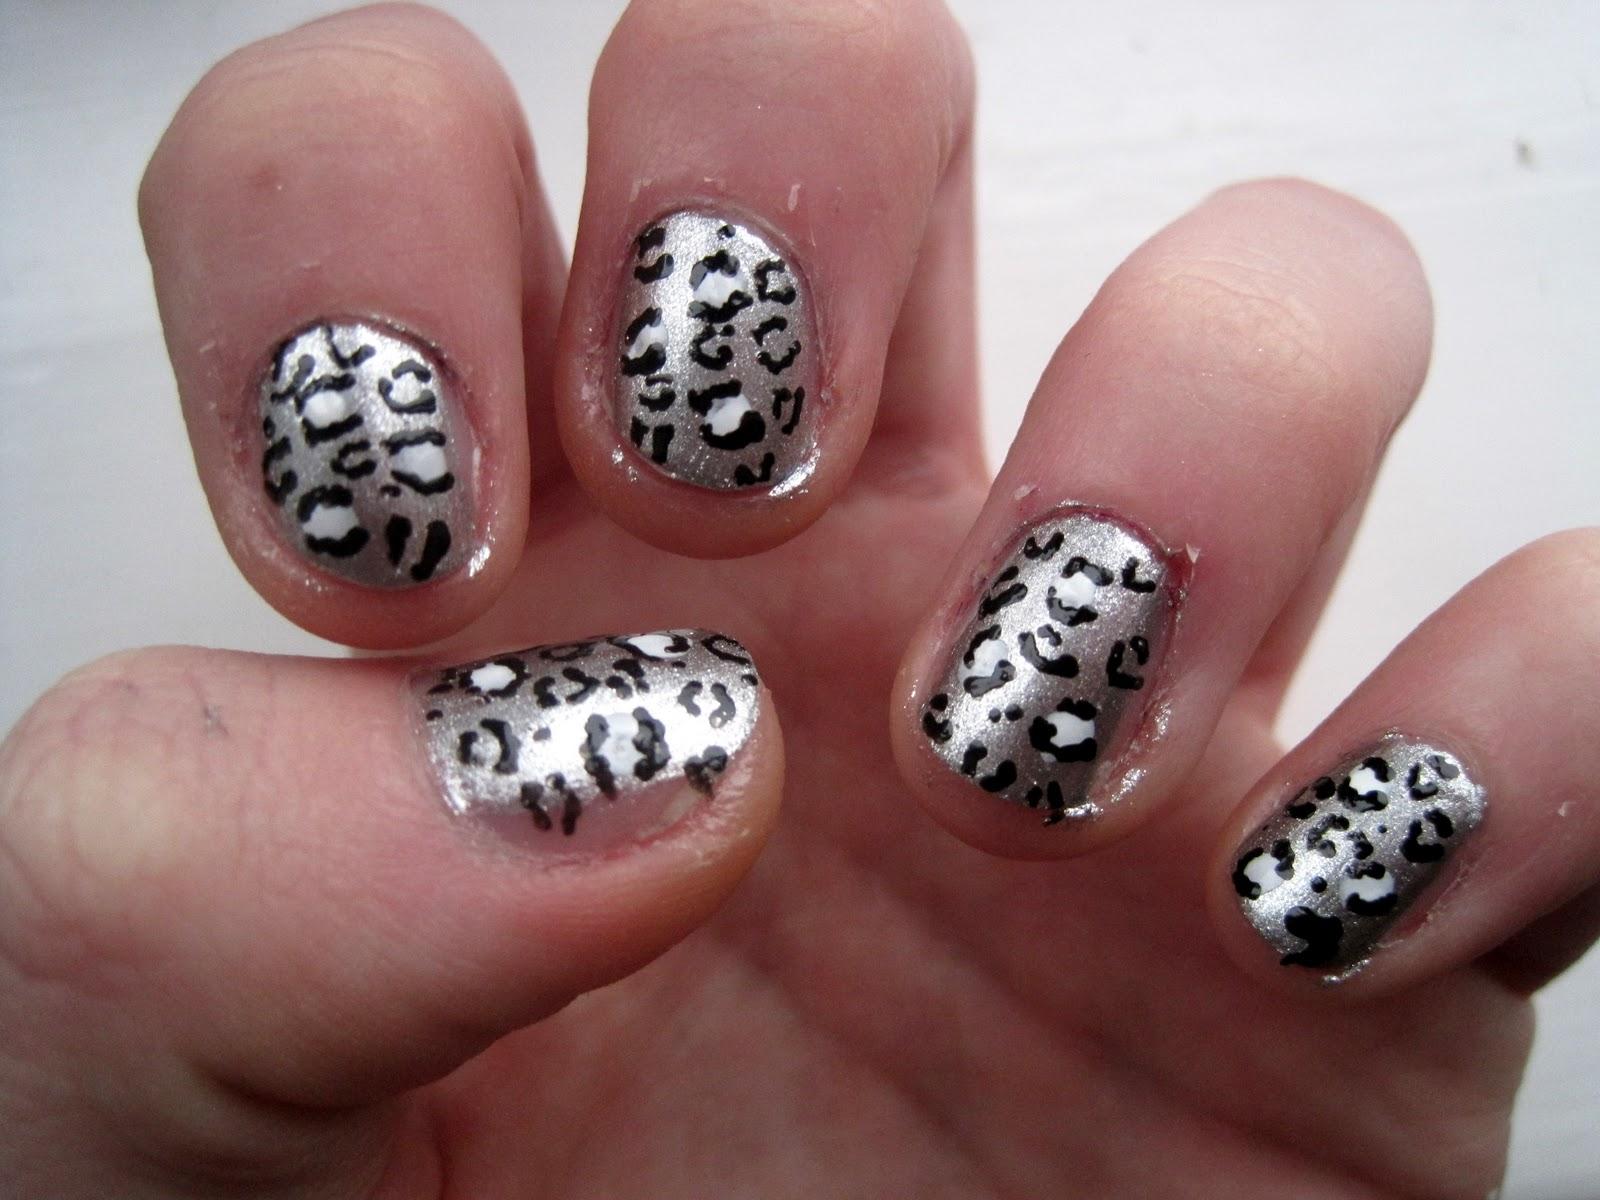 Cheetah Print Nails Designs | Nail Designs, Hair Styles ...